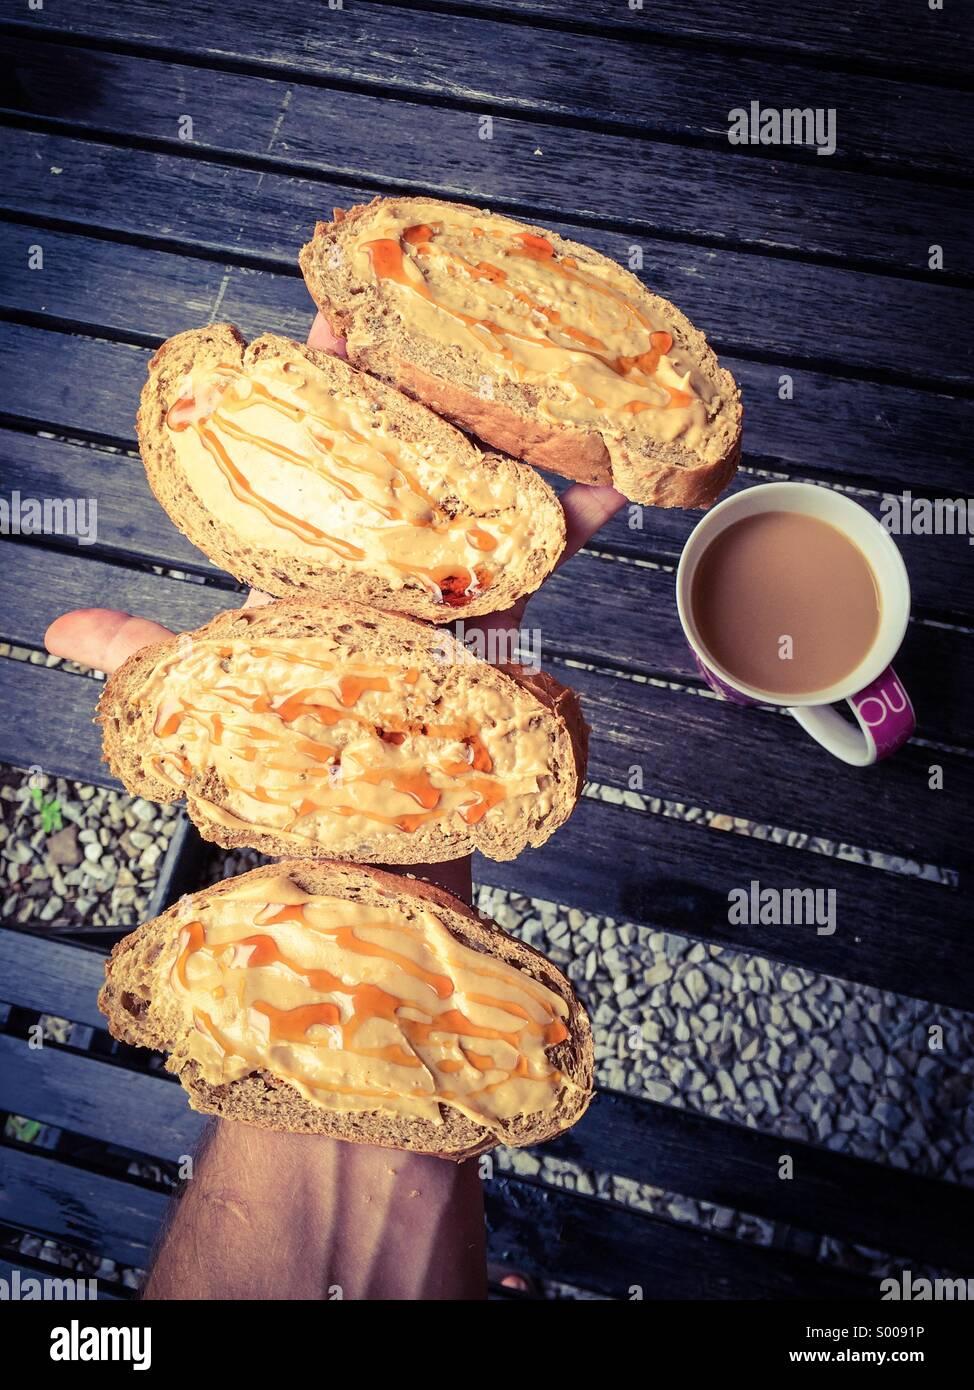 Déjeuner rapide. Photo Stock